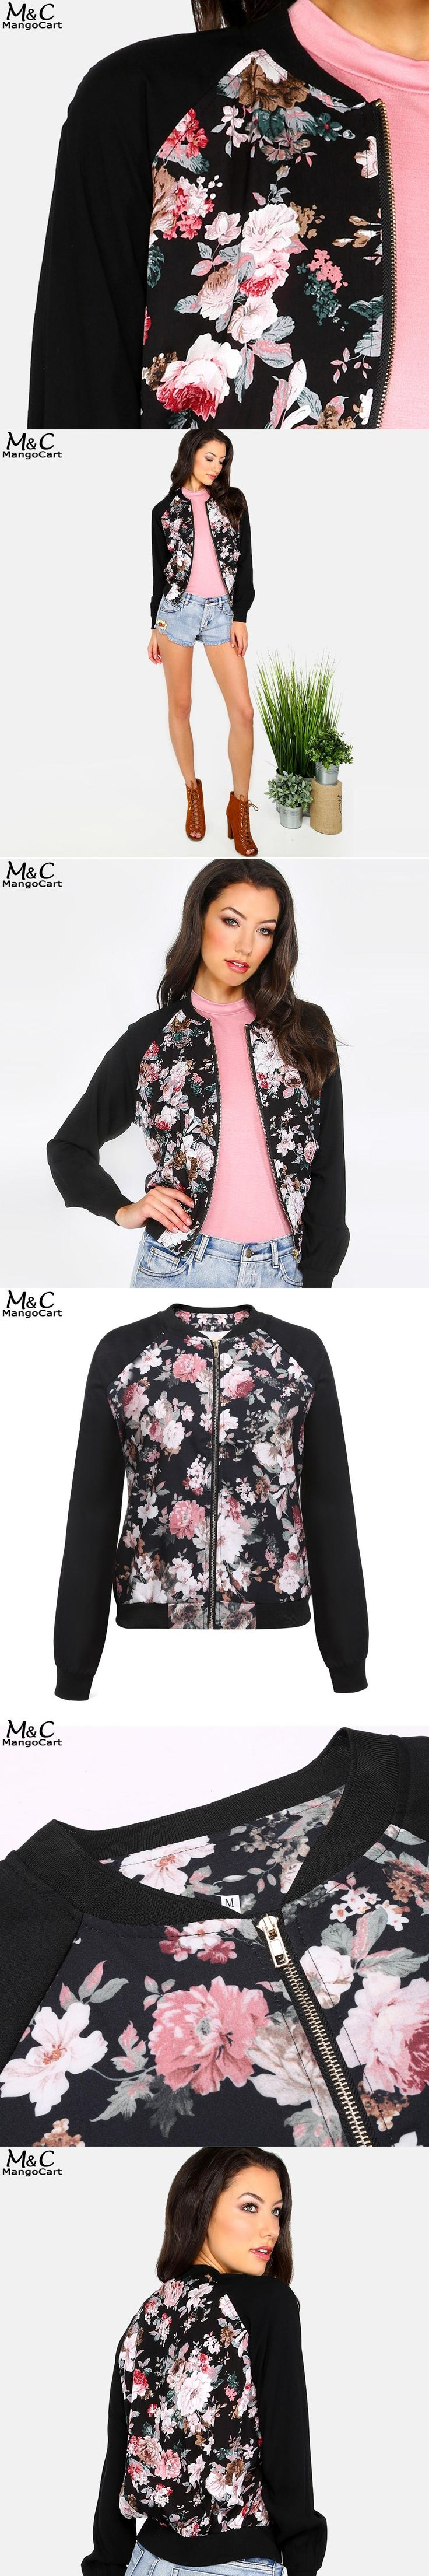 Women Bomber Jacket Coat Floral Print O-Neck 2017 Casual Zipper Jackets Women Autumn Jacket Coat Long Sleeve Outwear Jackets